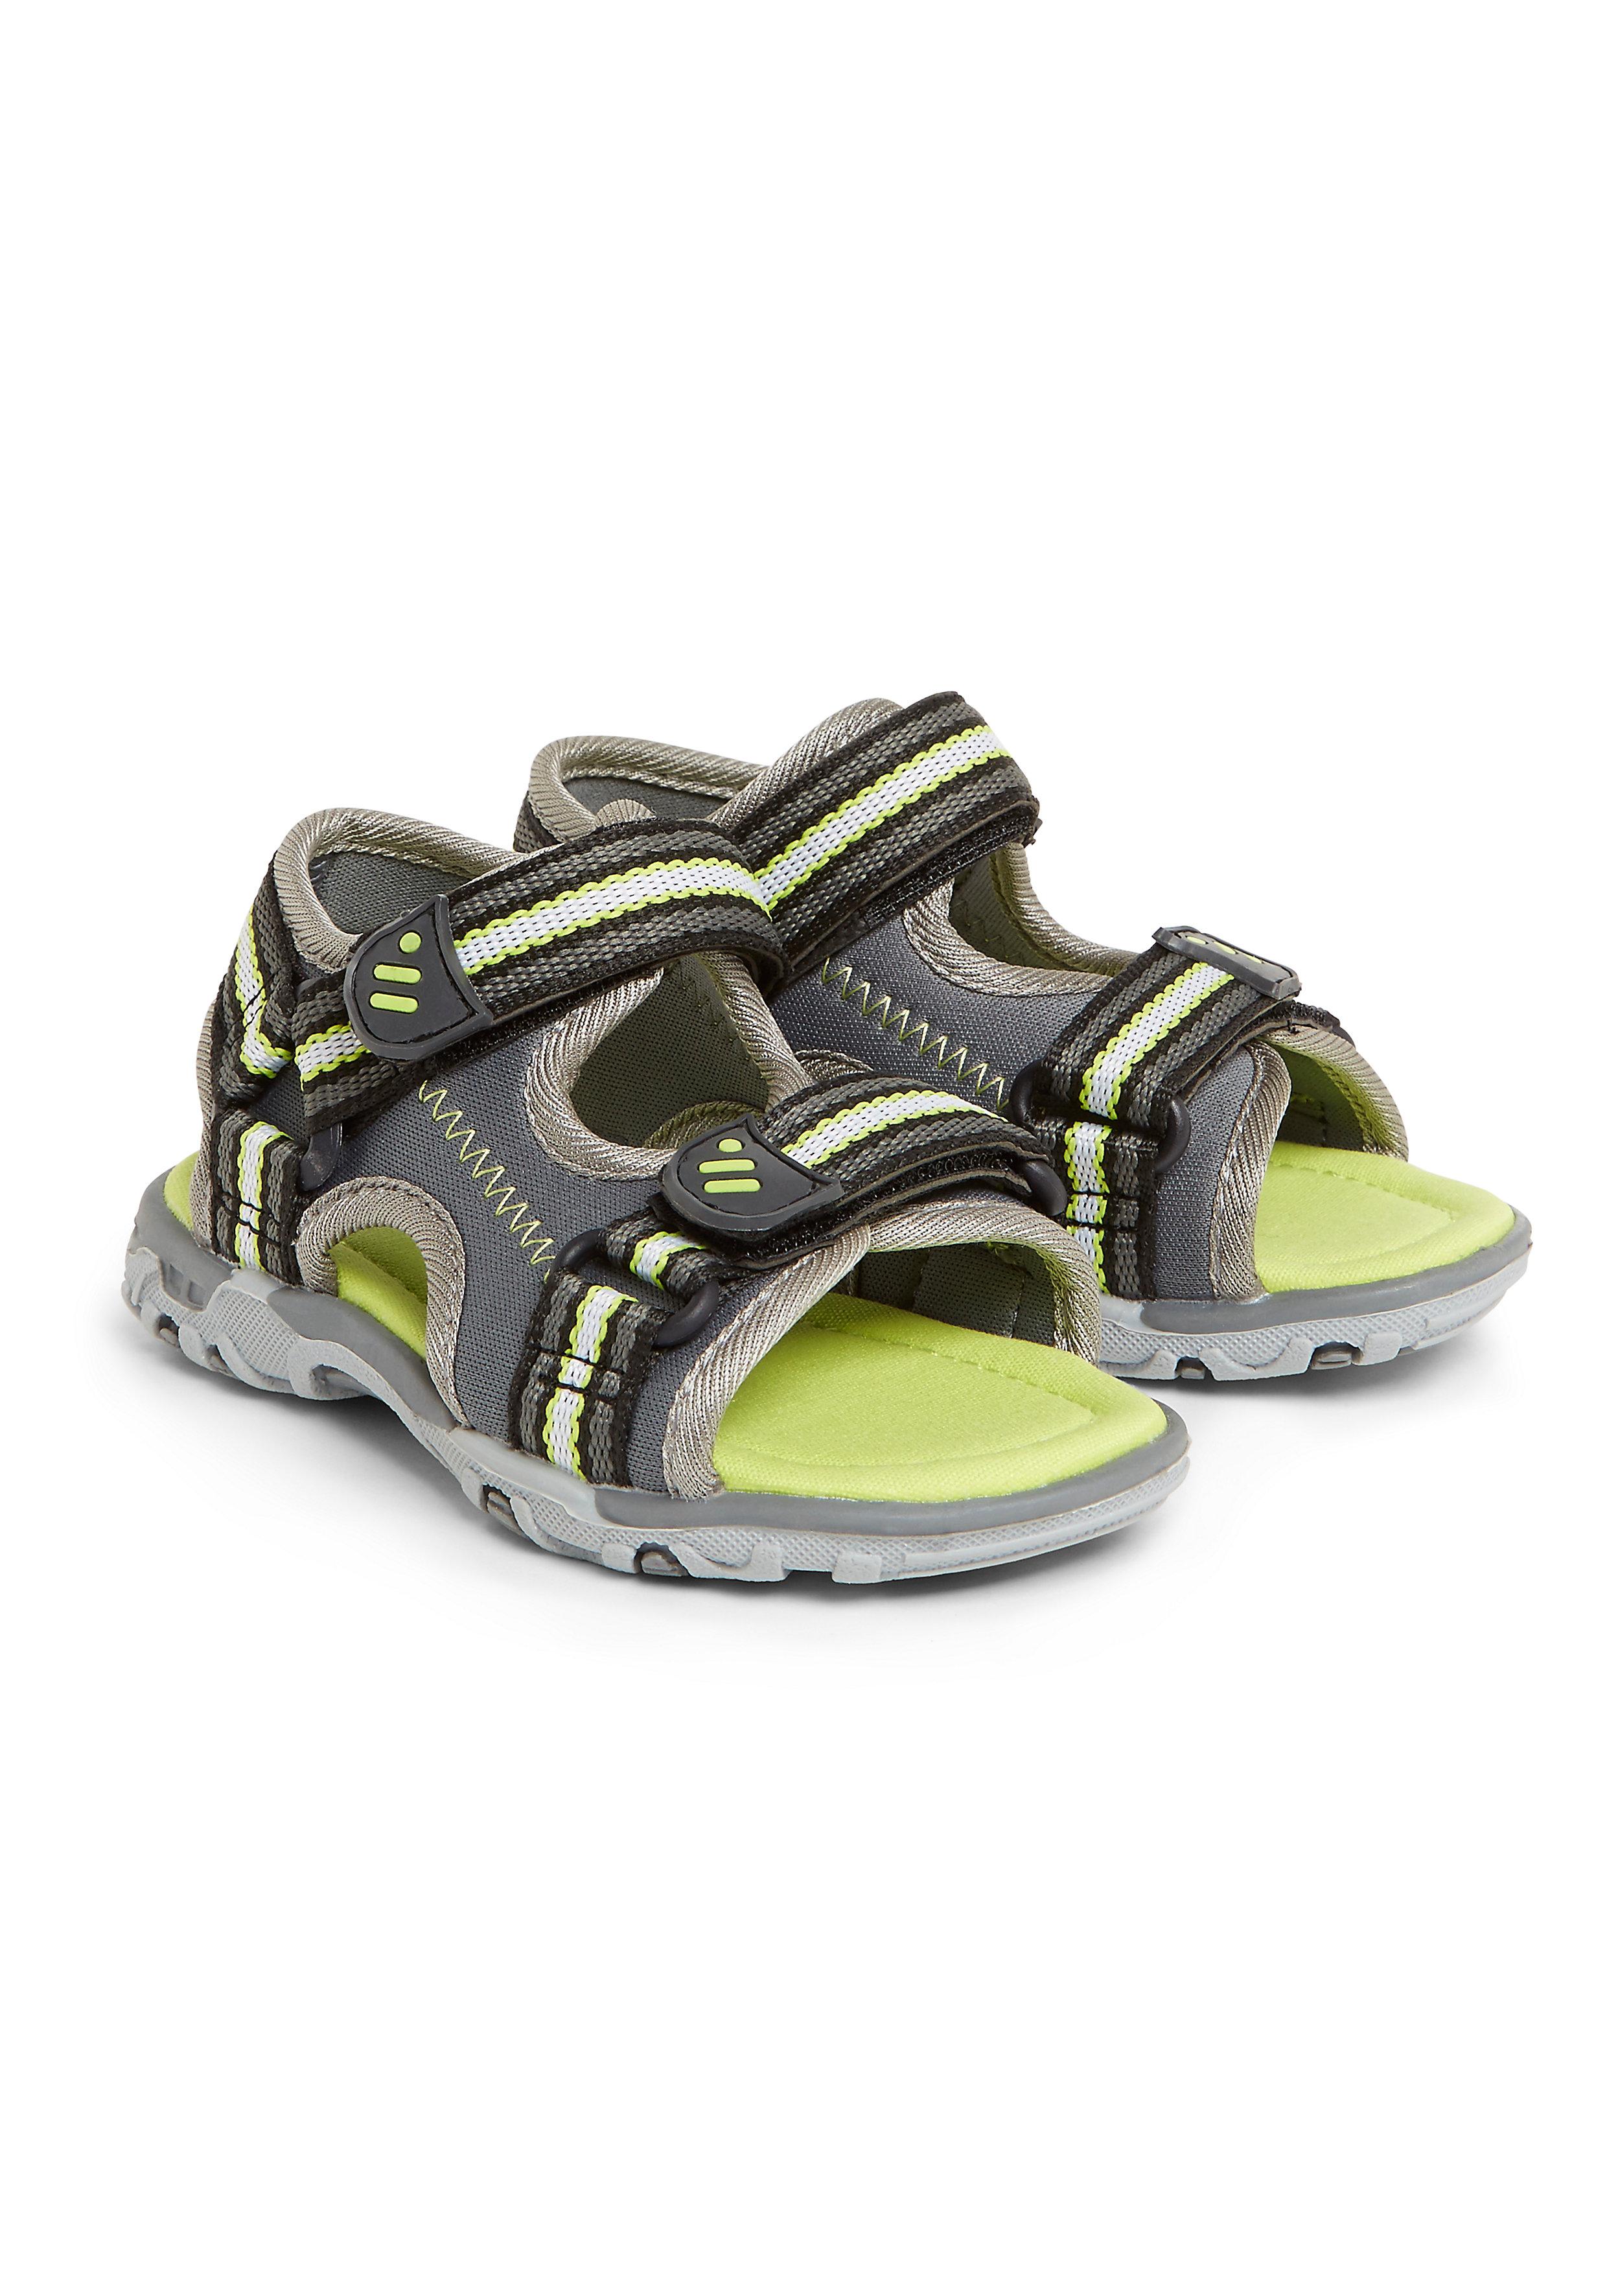 Mothercare | Boys Trekker Sandals - Grey